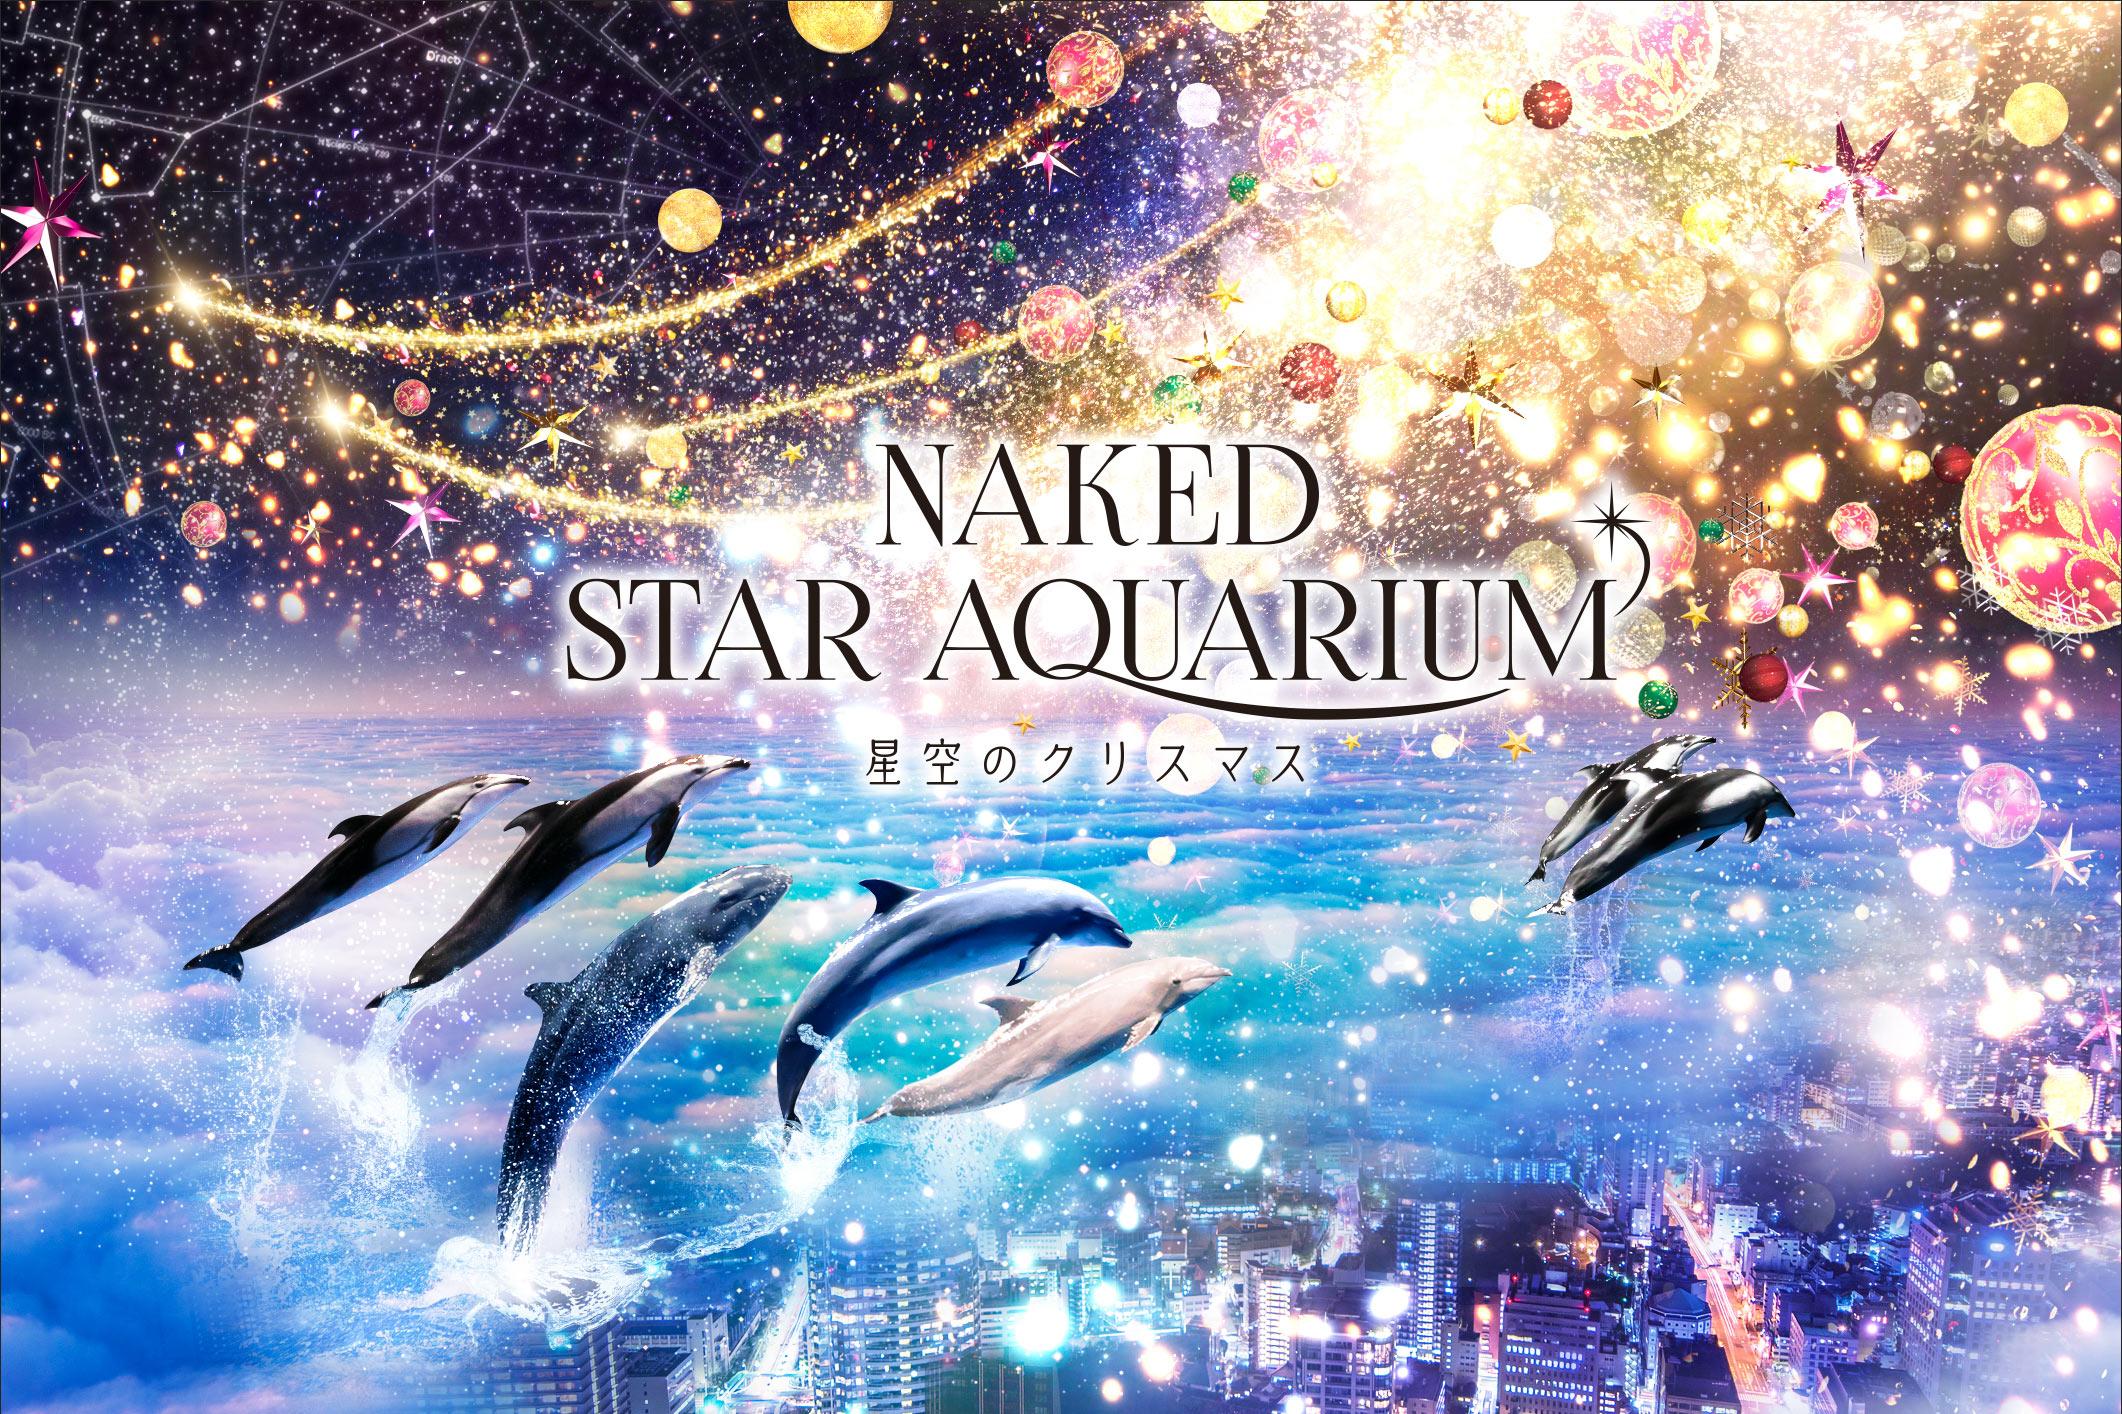 NAKED STAR AQUARIUM -星空のクリスマス-